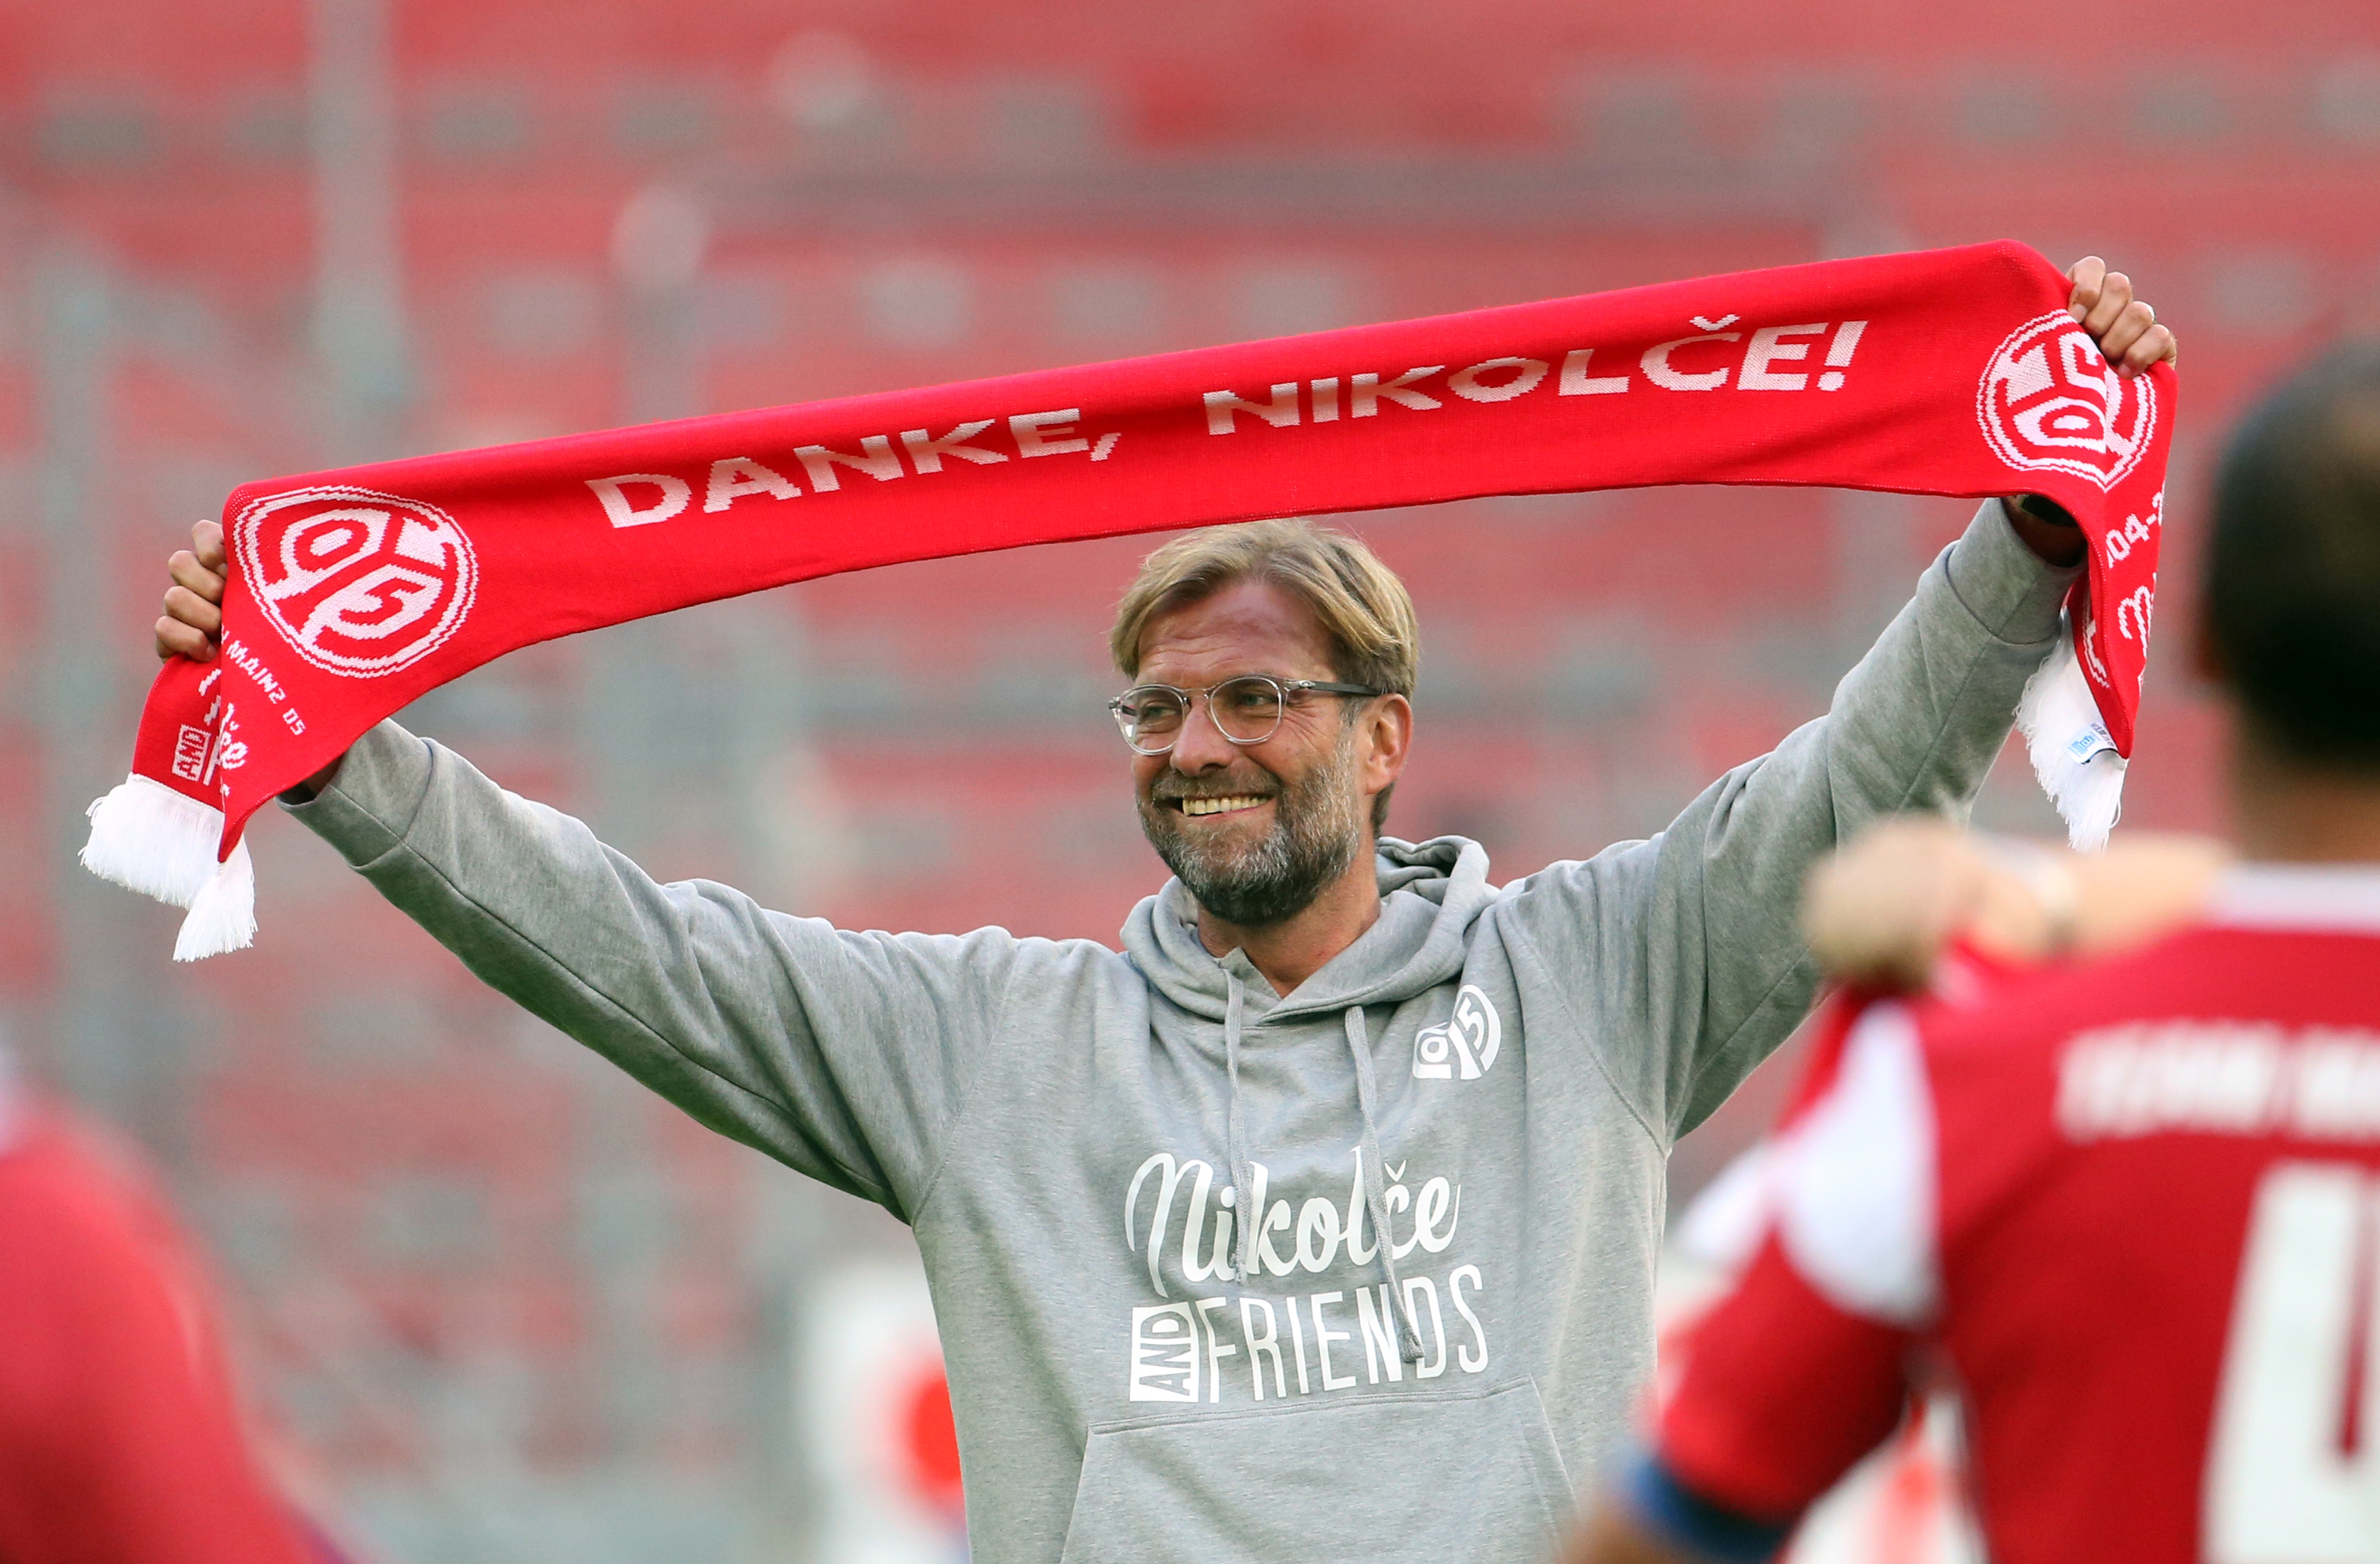 "Liverpool coach Jurgen Klopp holds a football scarf that reads ""Dank, Nikolce"" (lit. thanks, Nikolce) at the FSV Mainz 05 vs ""Nikolce and friends"" football match at the Opel Arena in Mainz, Germany, 2 September 2017"